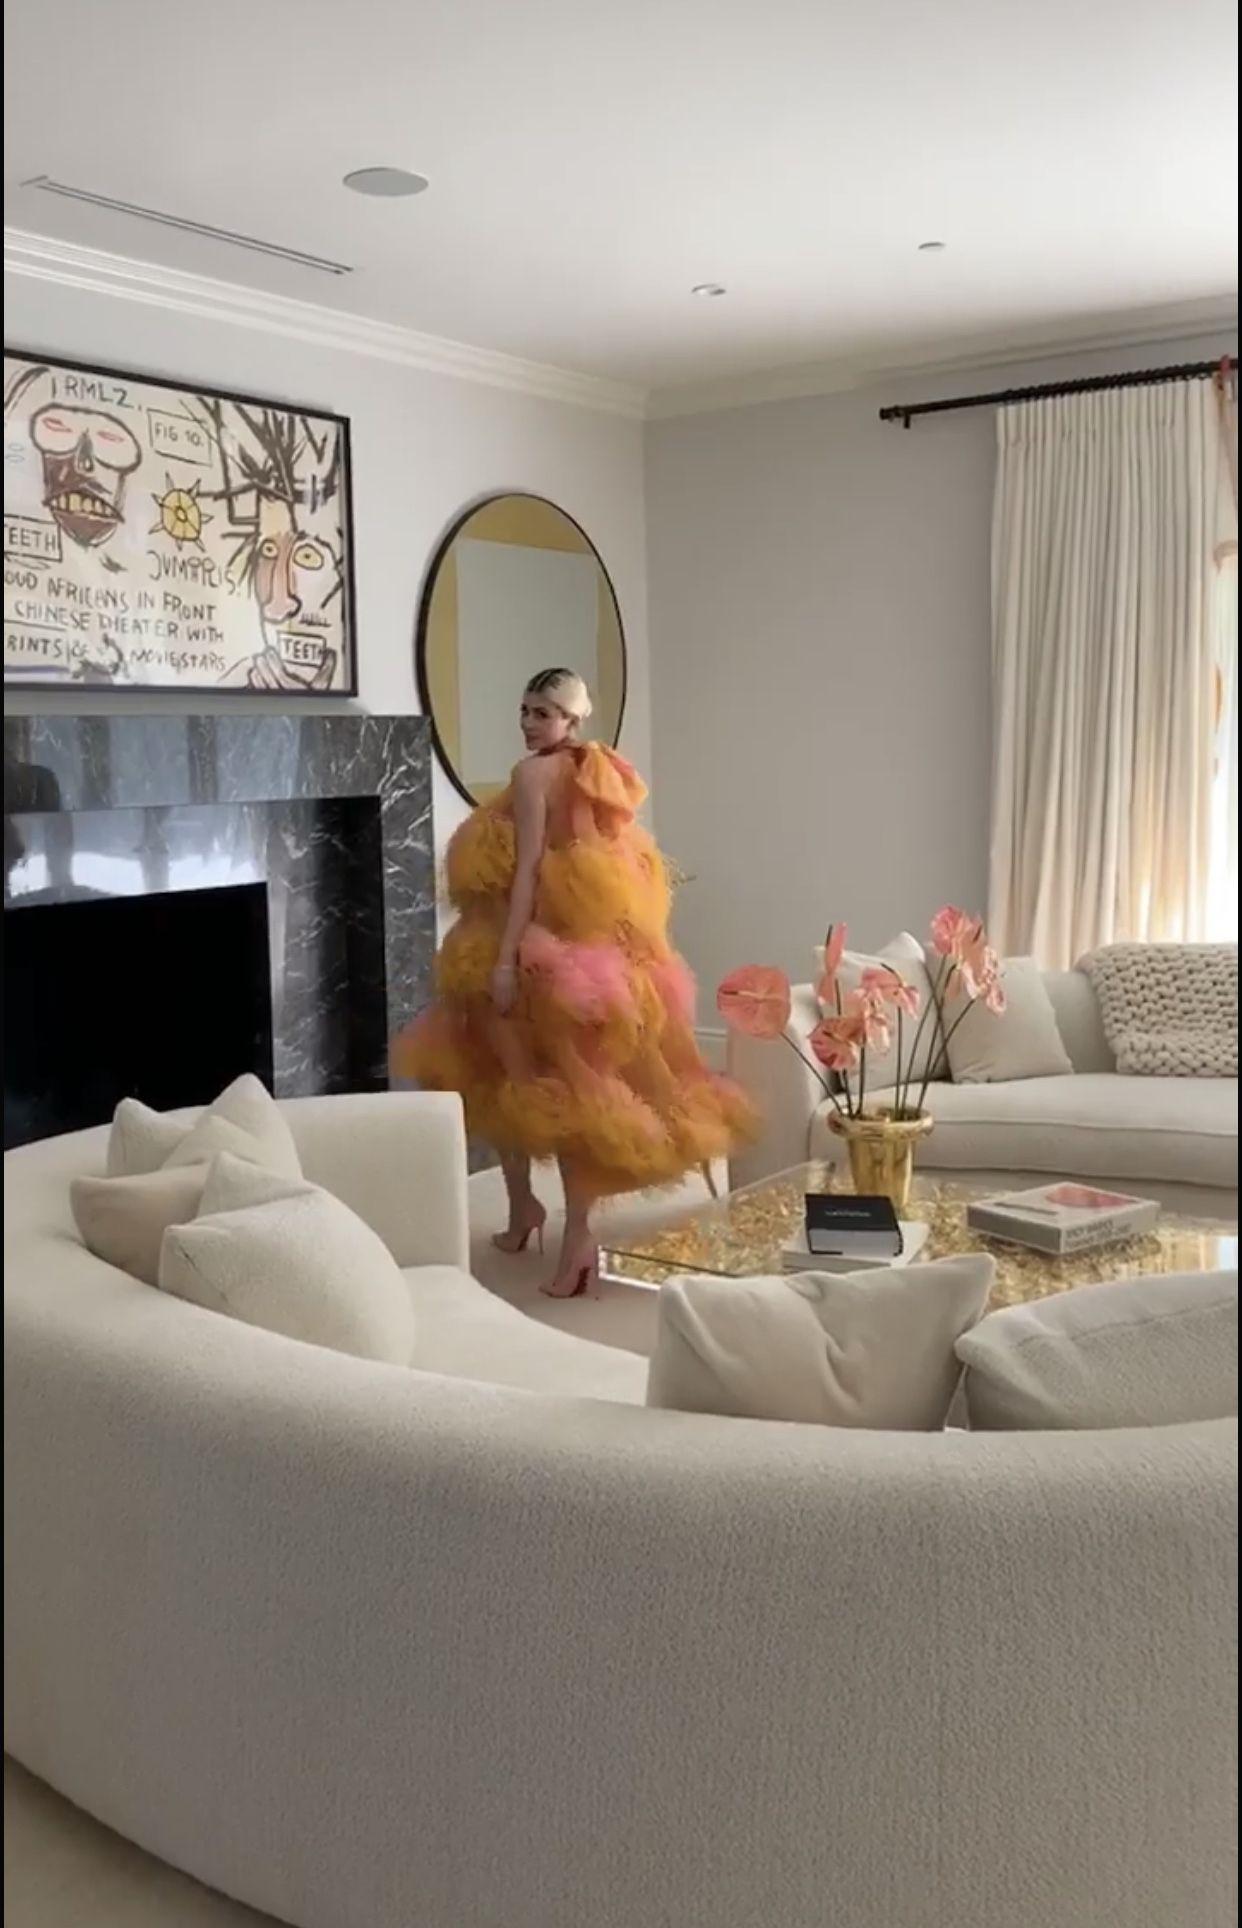 Kylie Jenner S Living Room Celebrity Houses Interior Dream House Interior Home Interior Design Celebrity living rooms decor